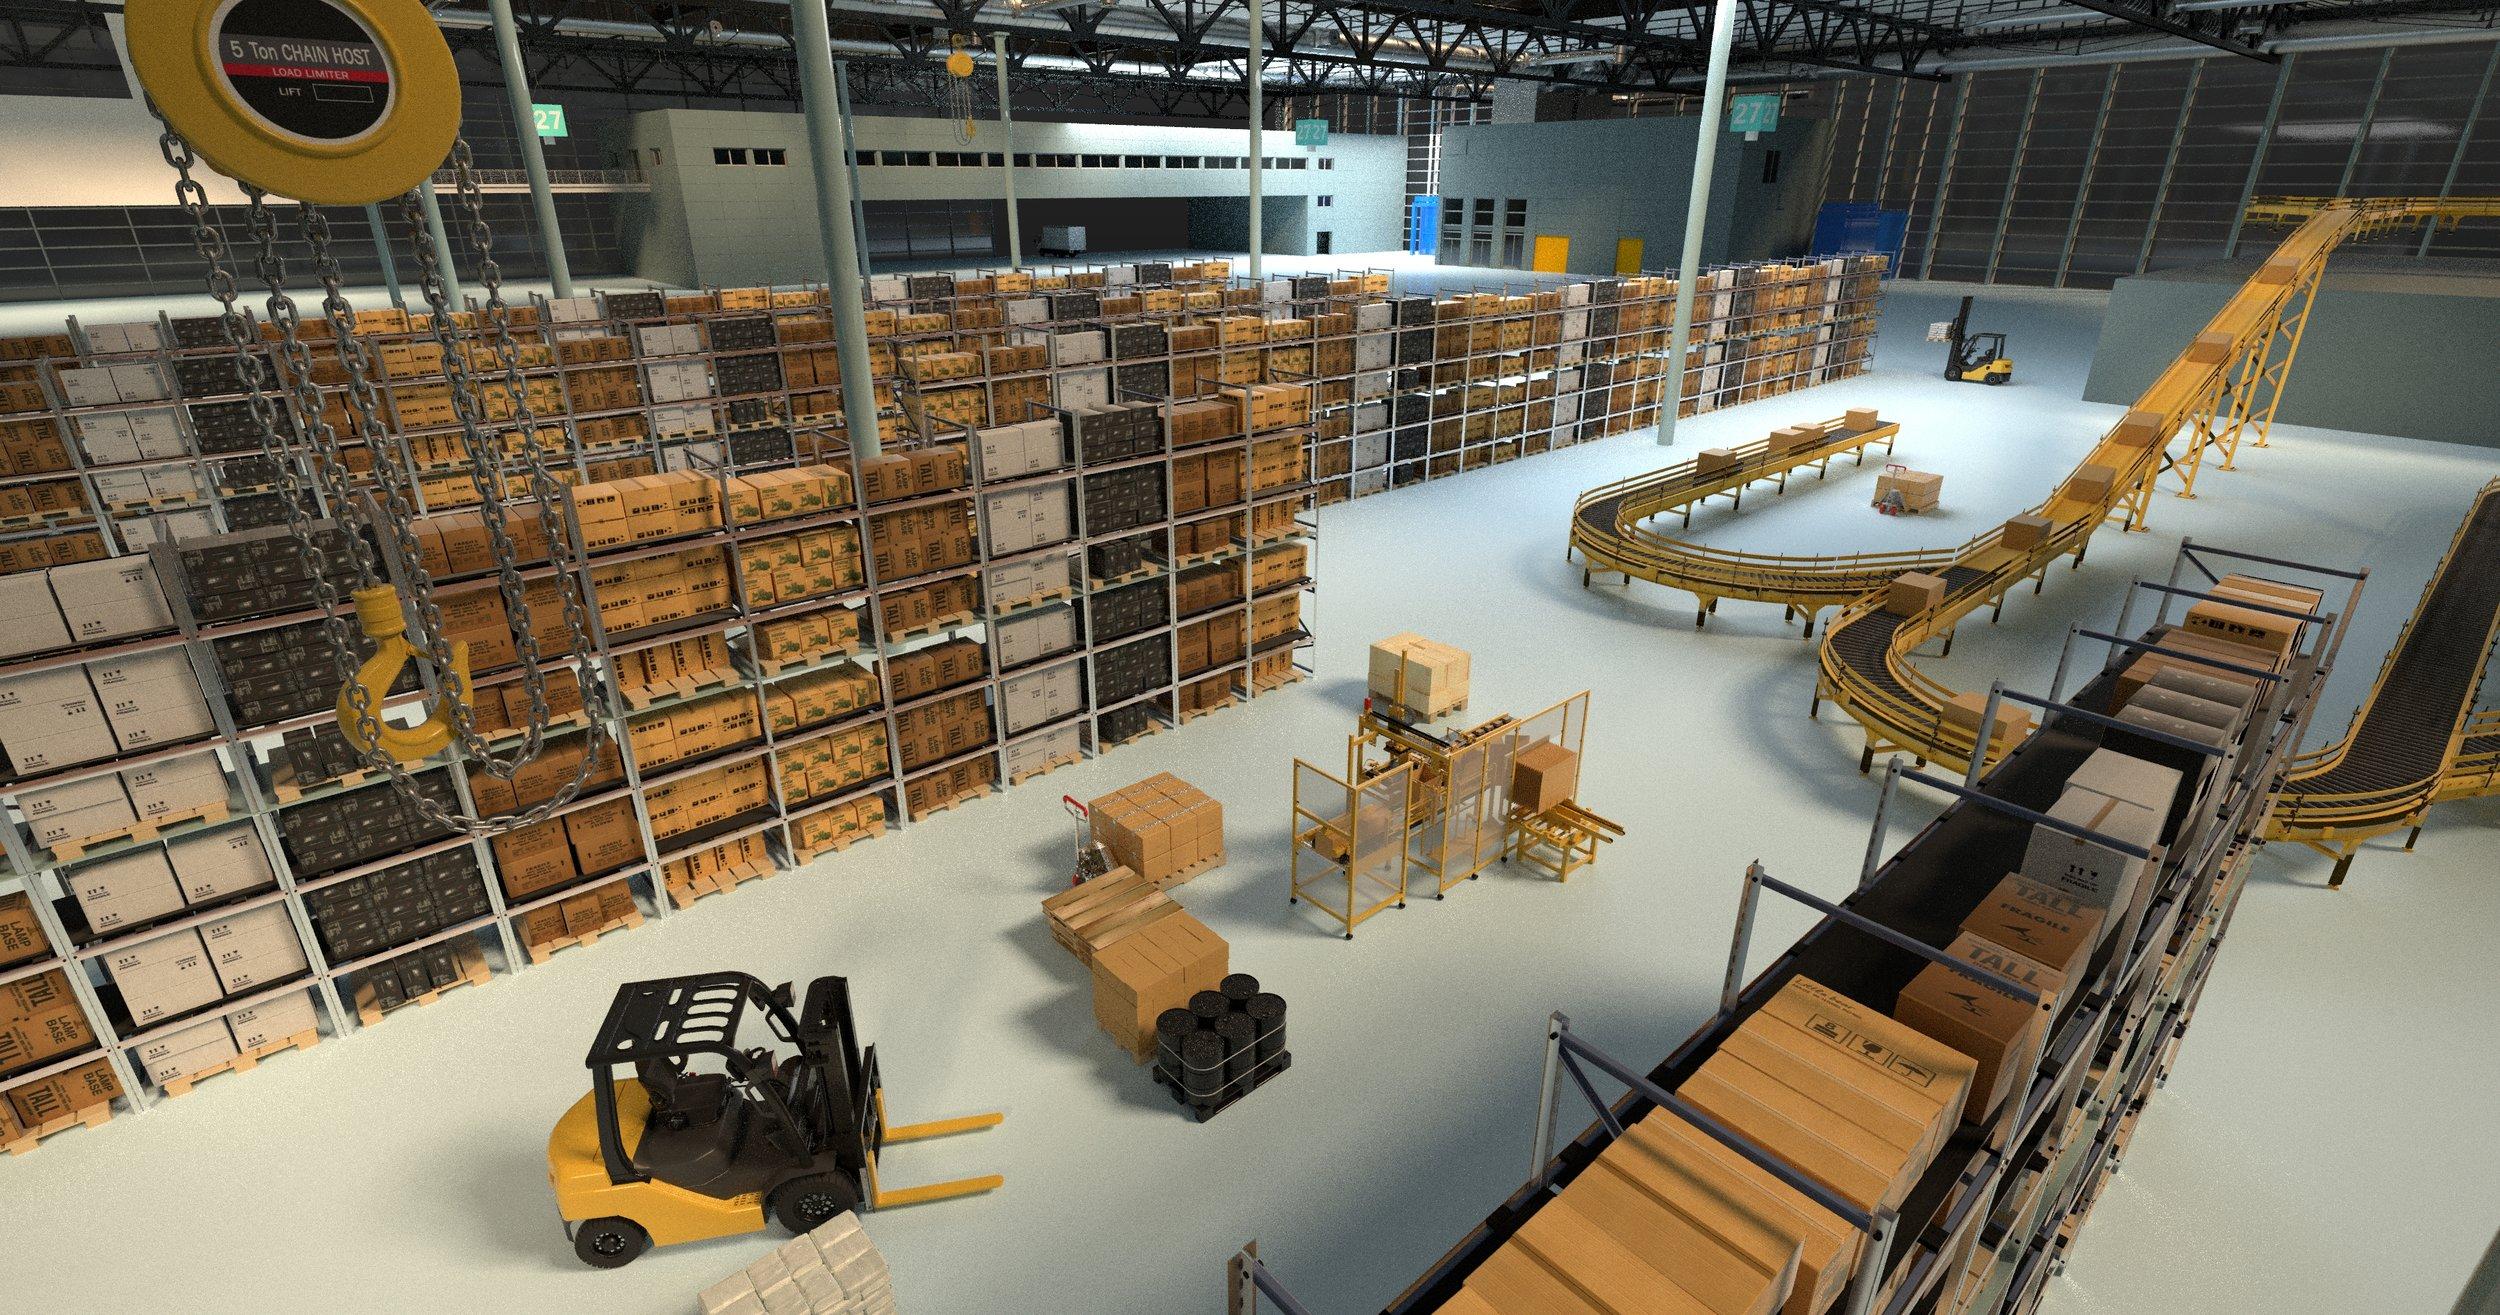 Warehouse Rendering for B2B